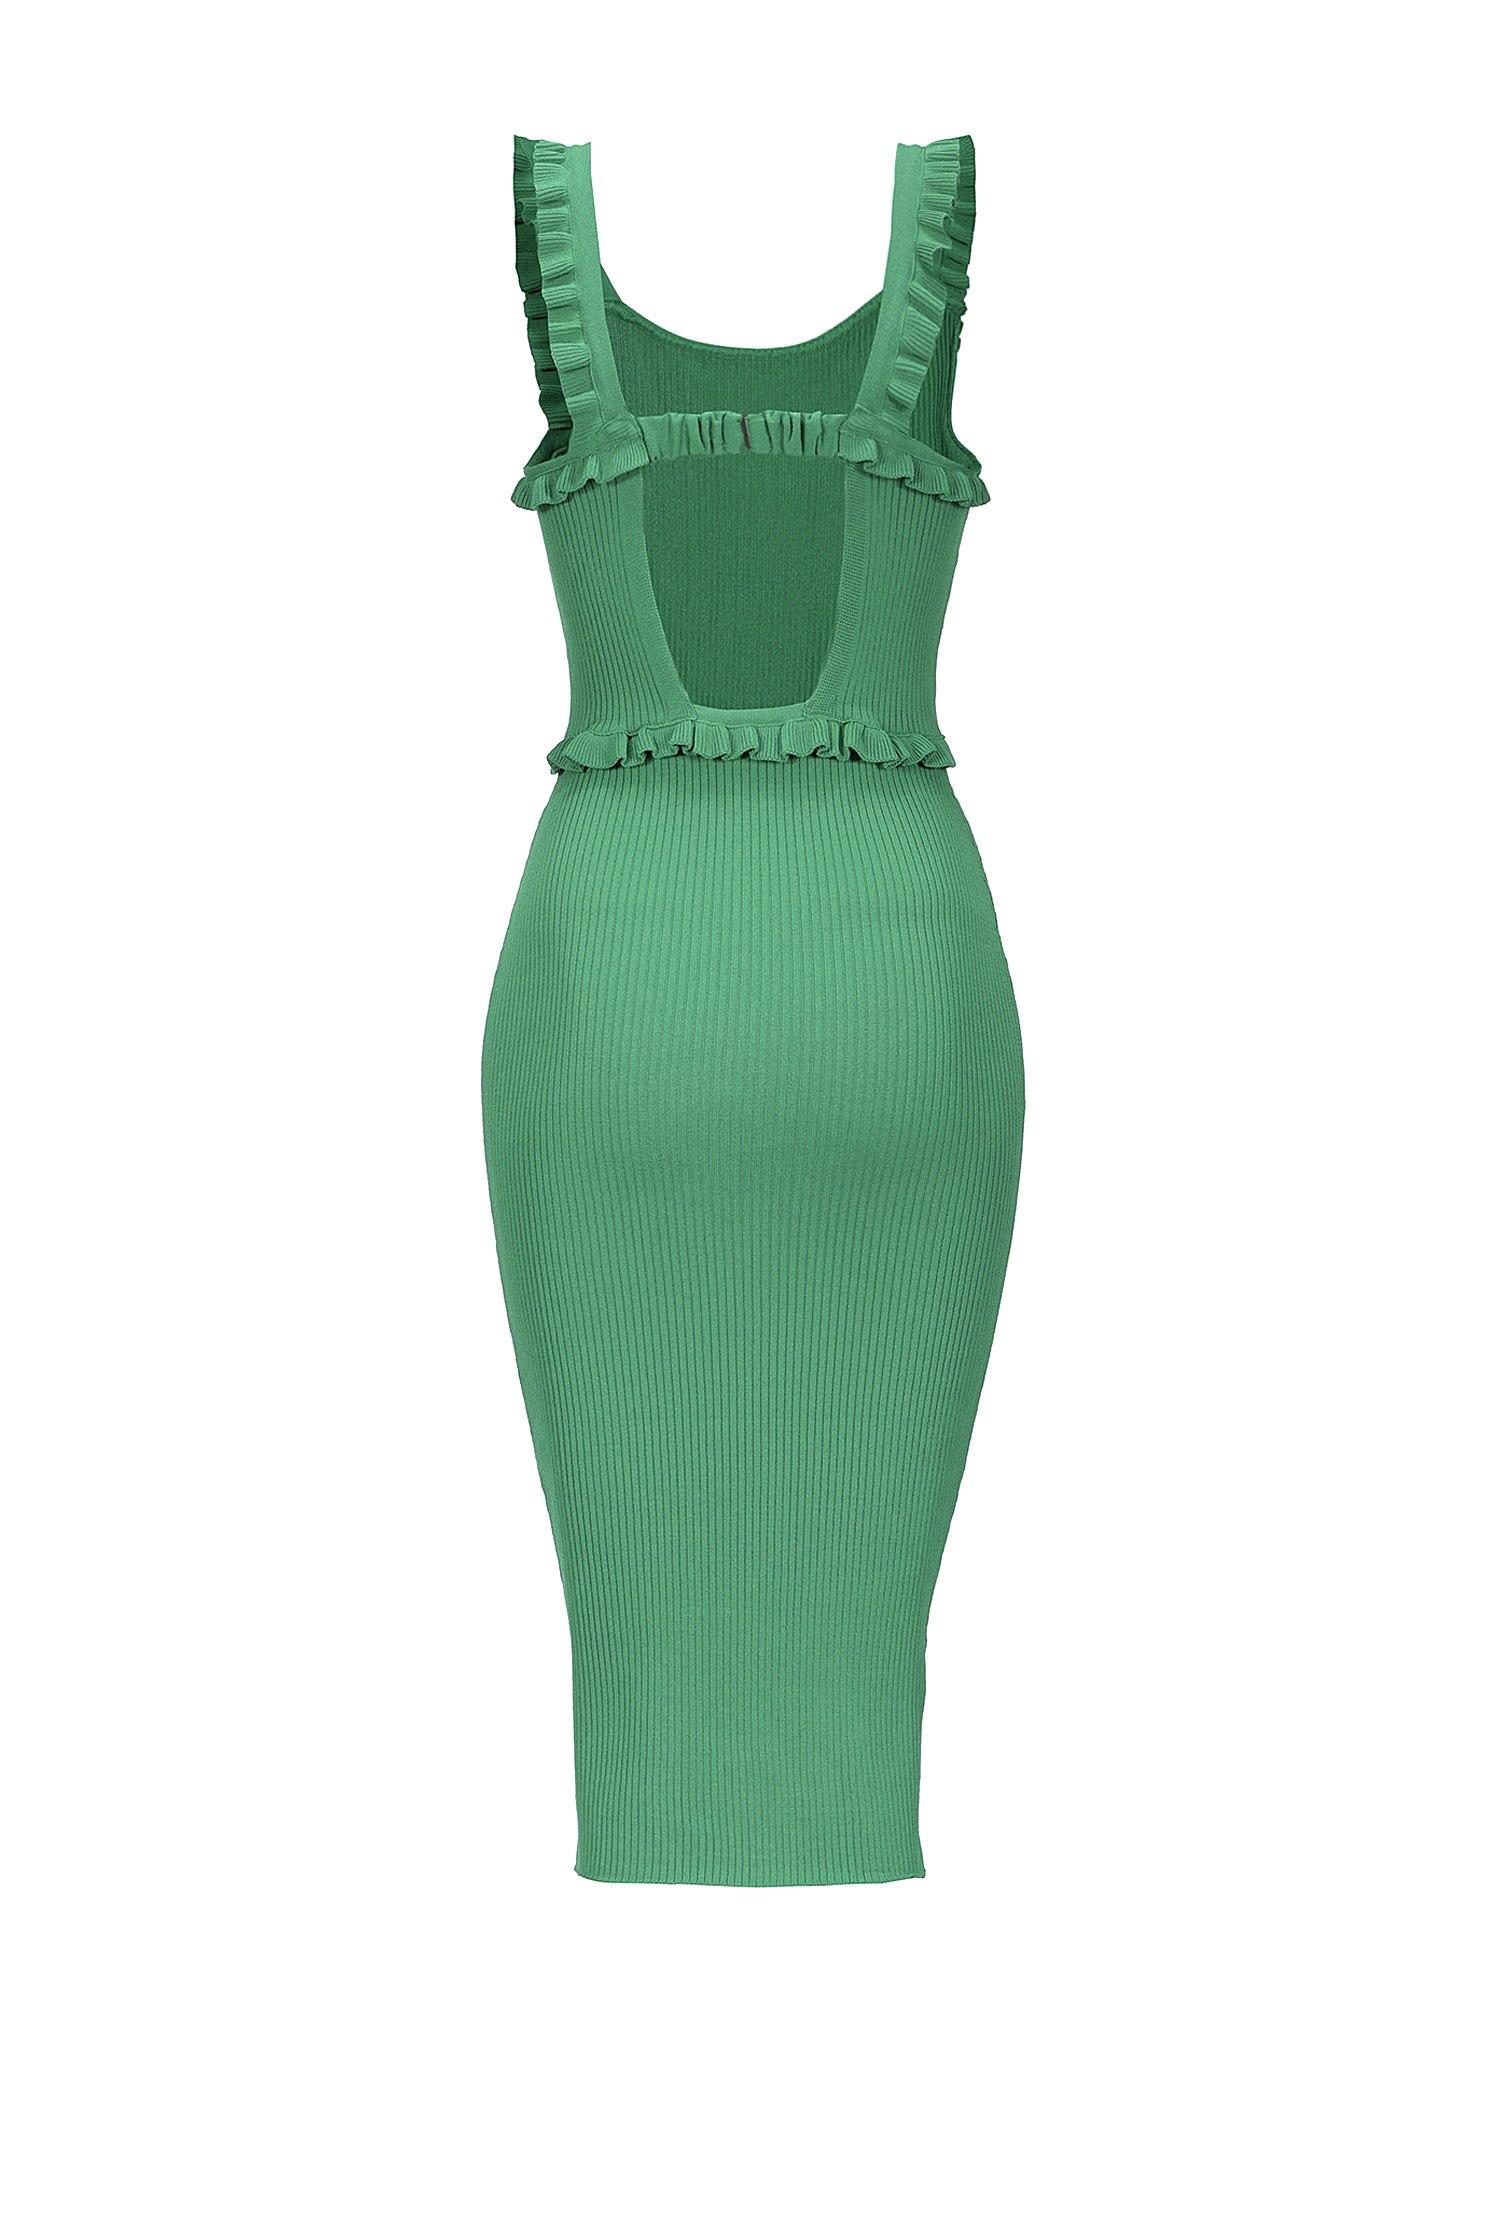 pinko verde